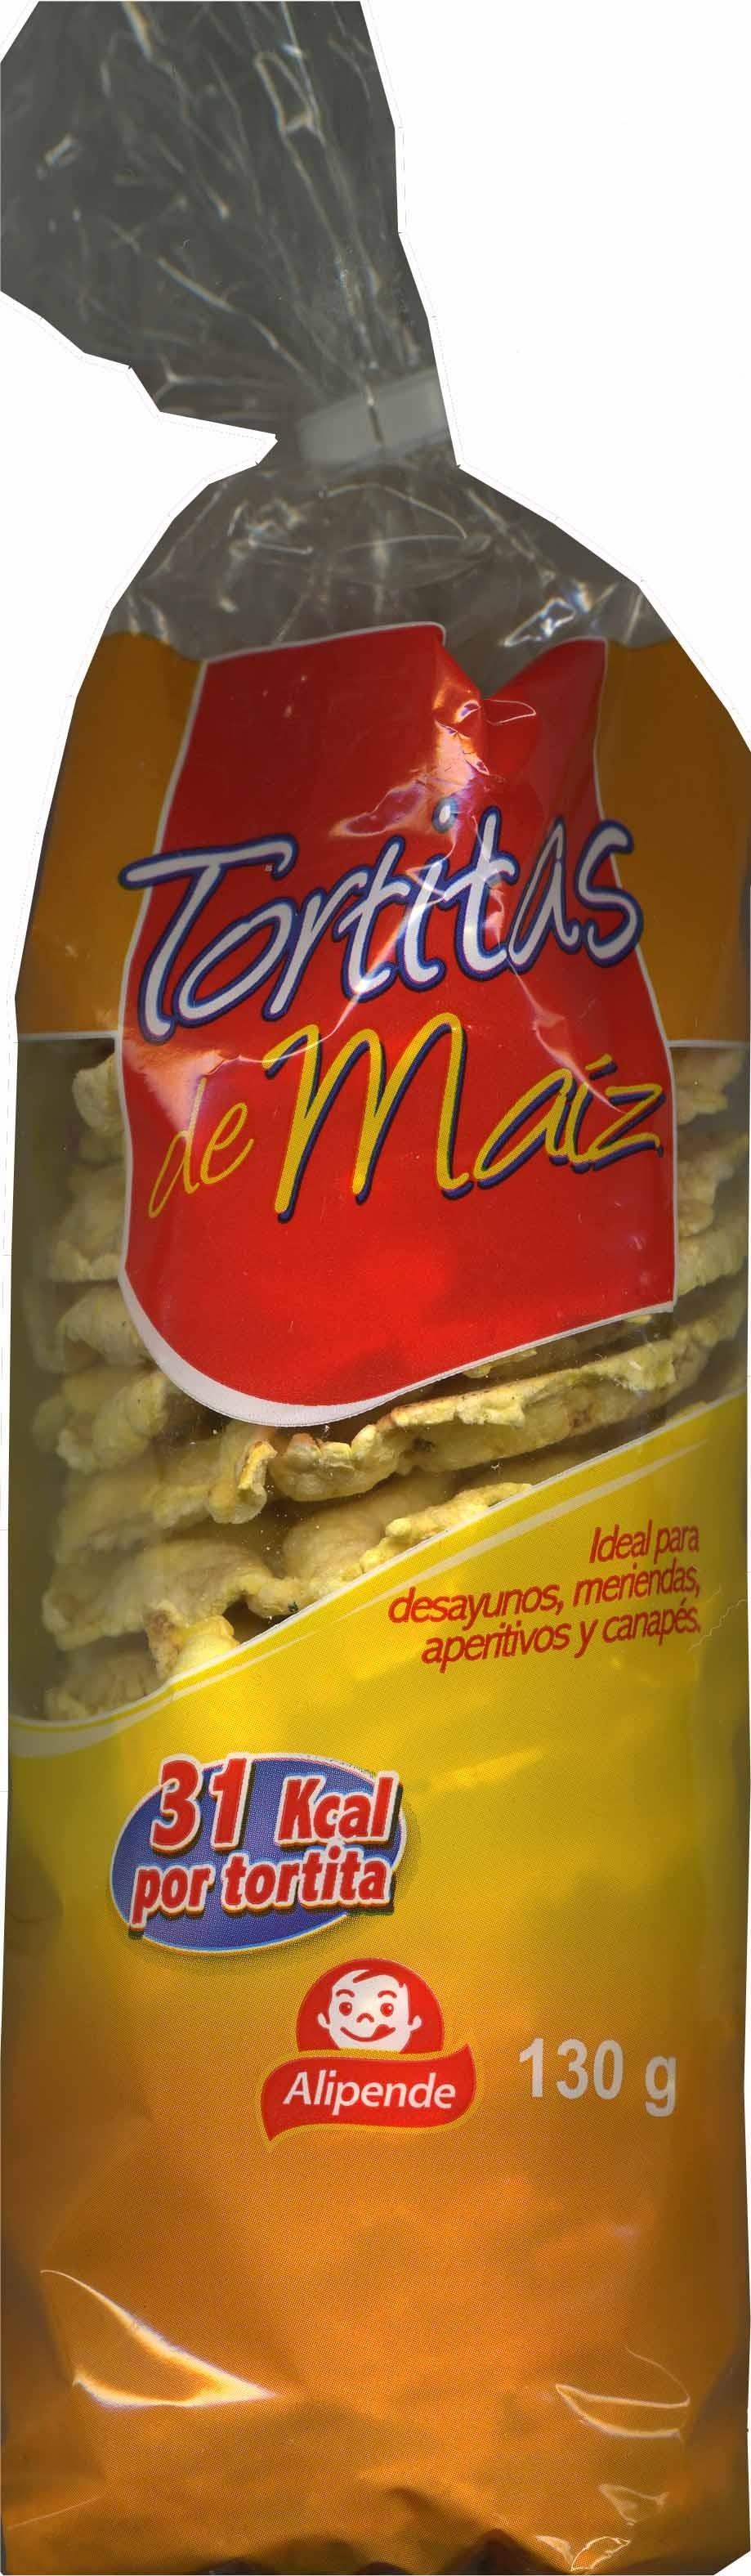 Tortitas de maiz - Producto